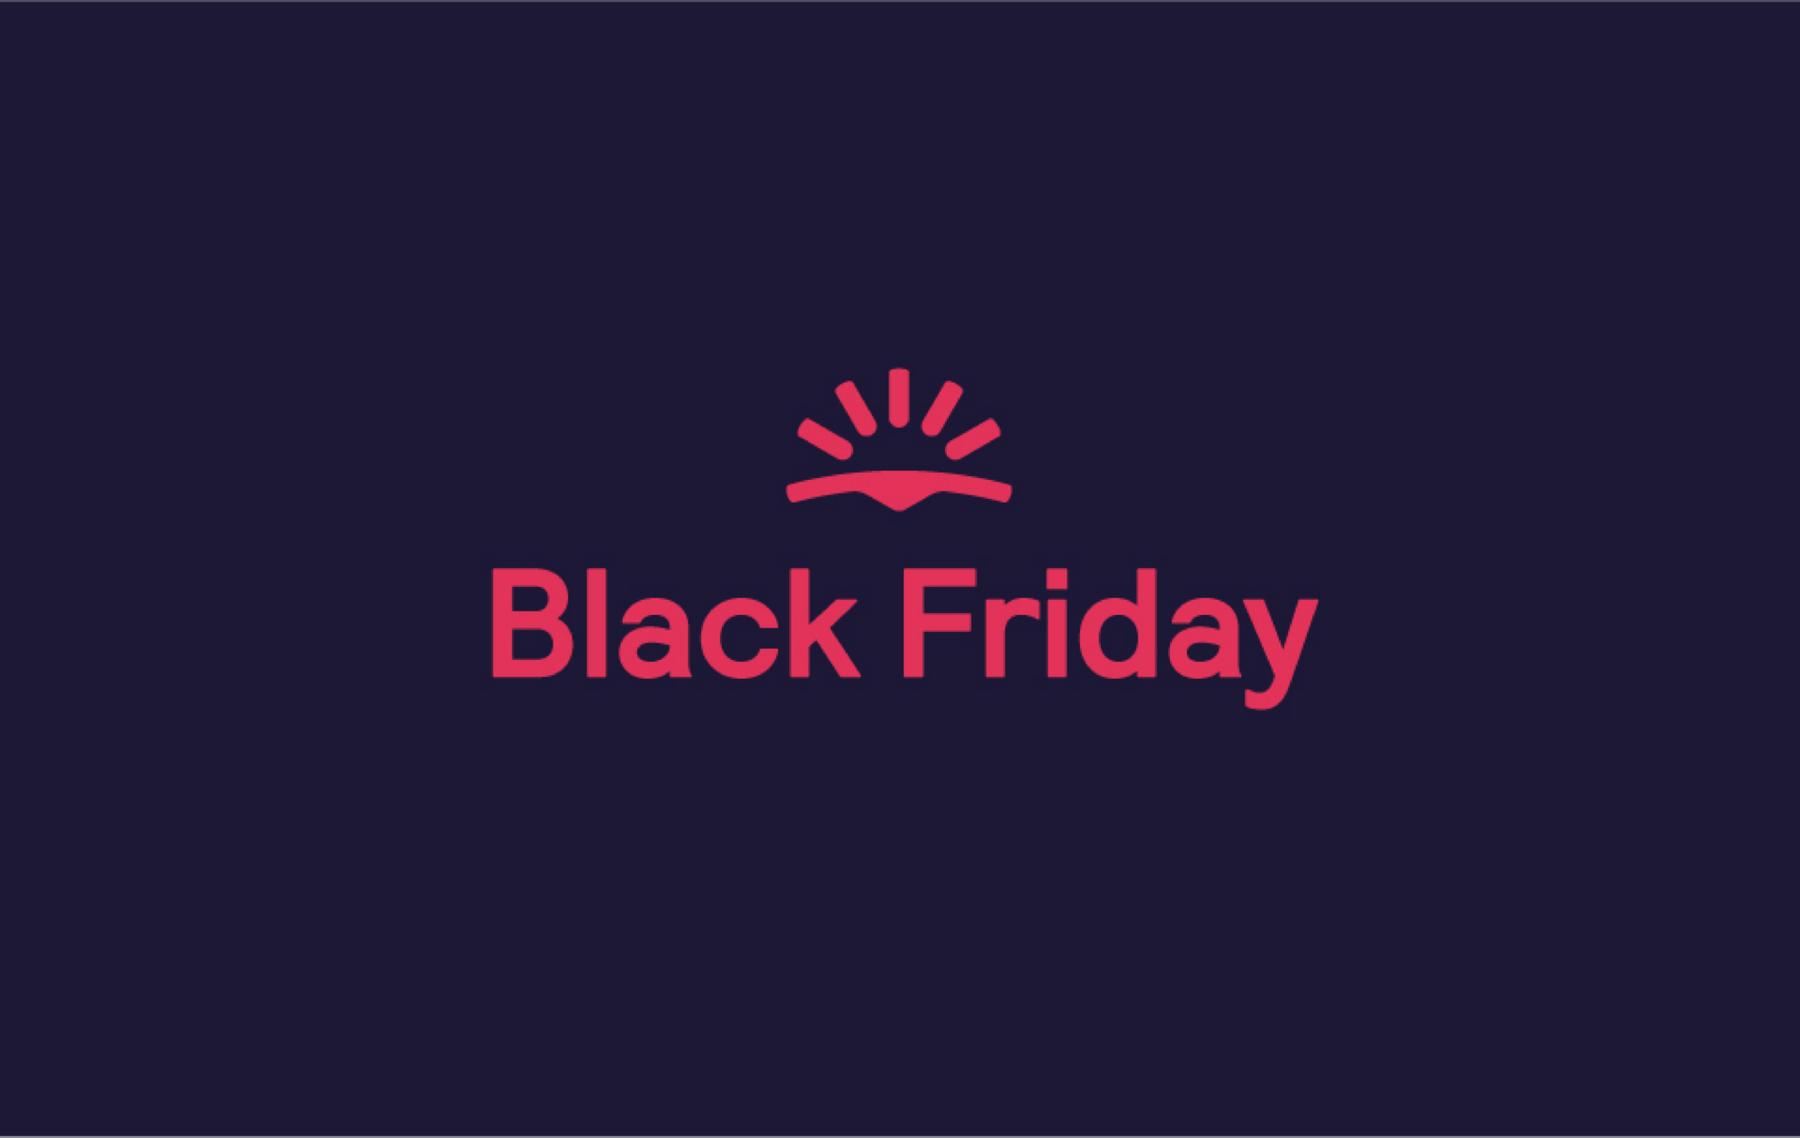 Virgin Australia Black Friday Sale Skyscanner Australia